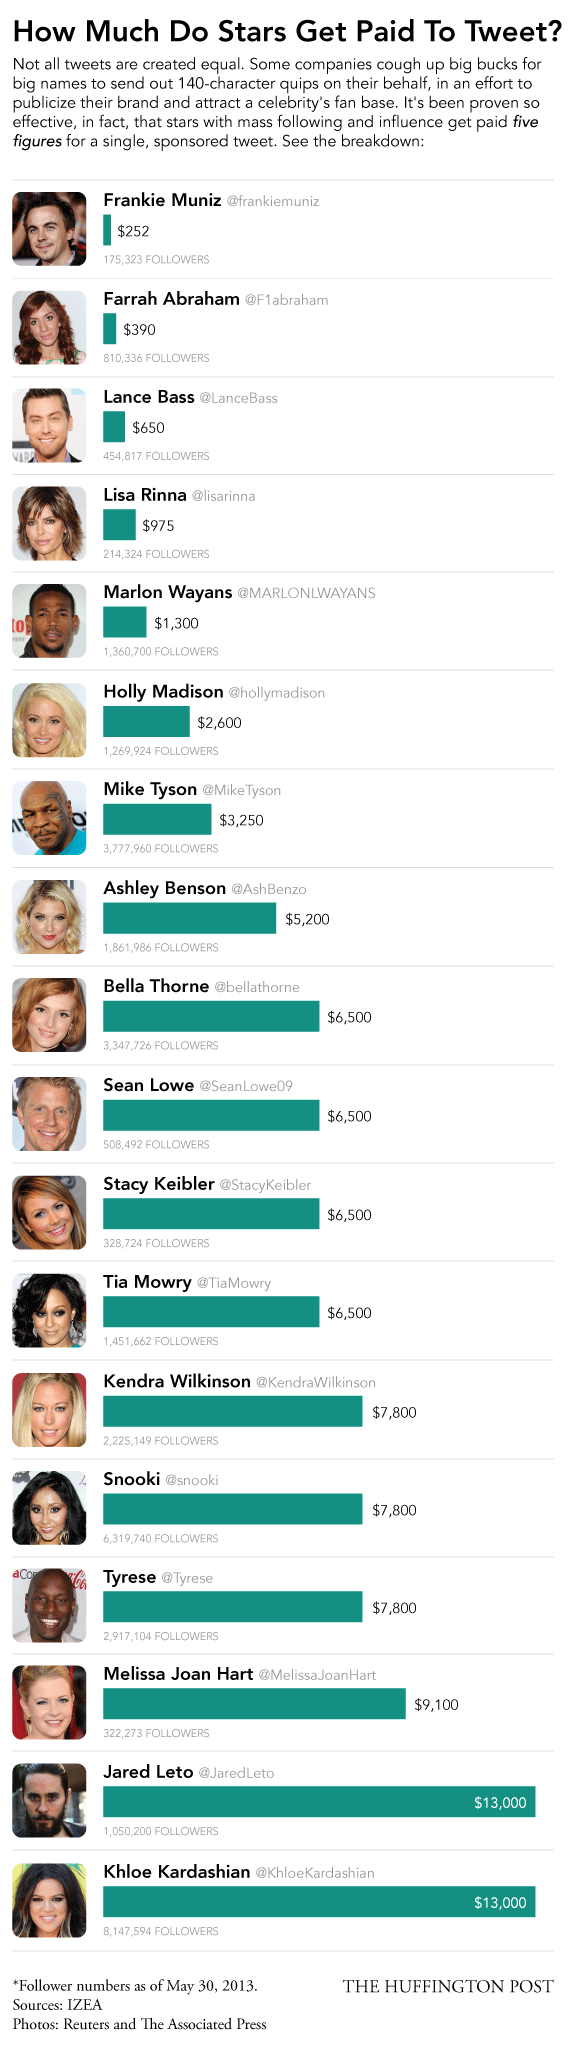 Celebrities paid thousands for endorsement tweets - CBS News